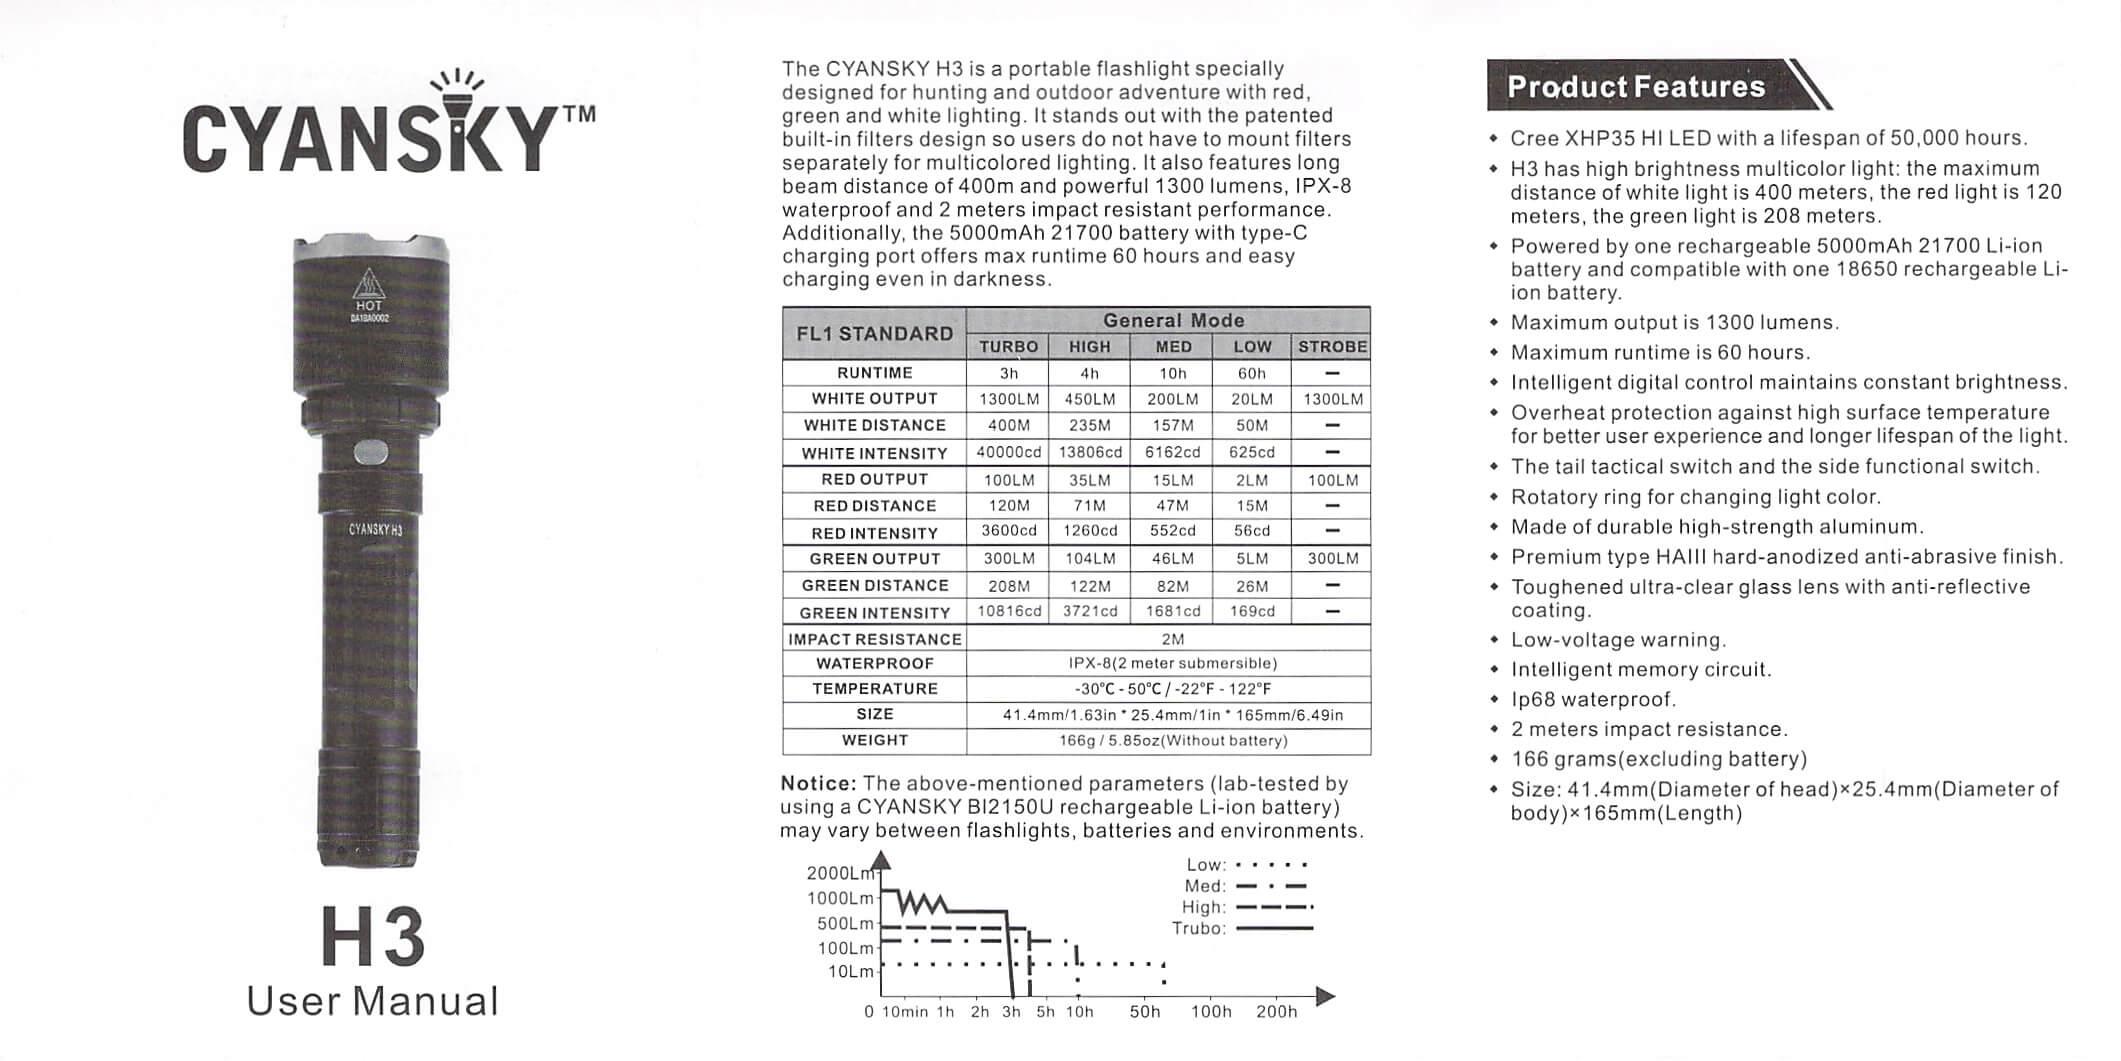 cyansky h3 manual